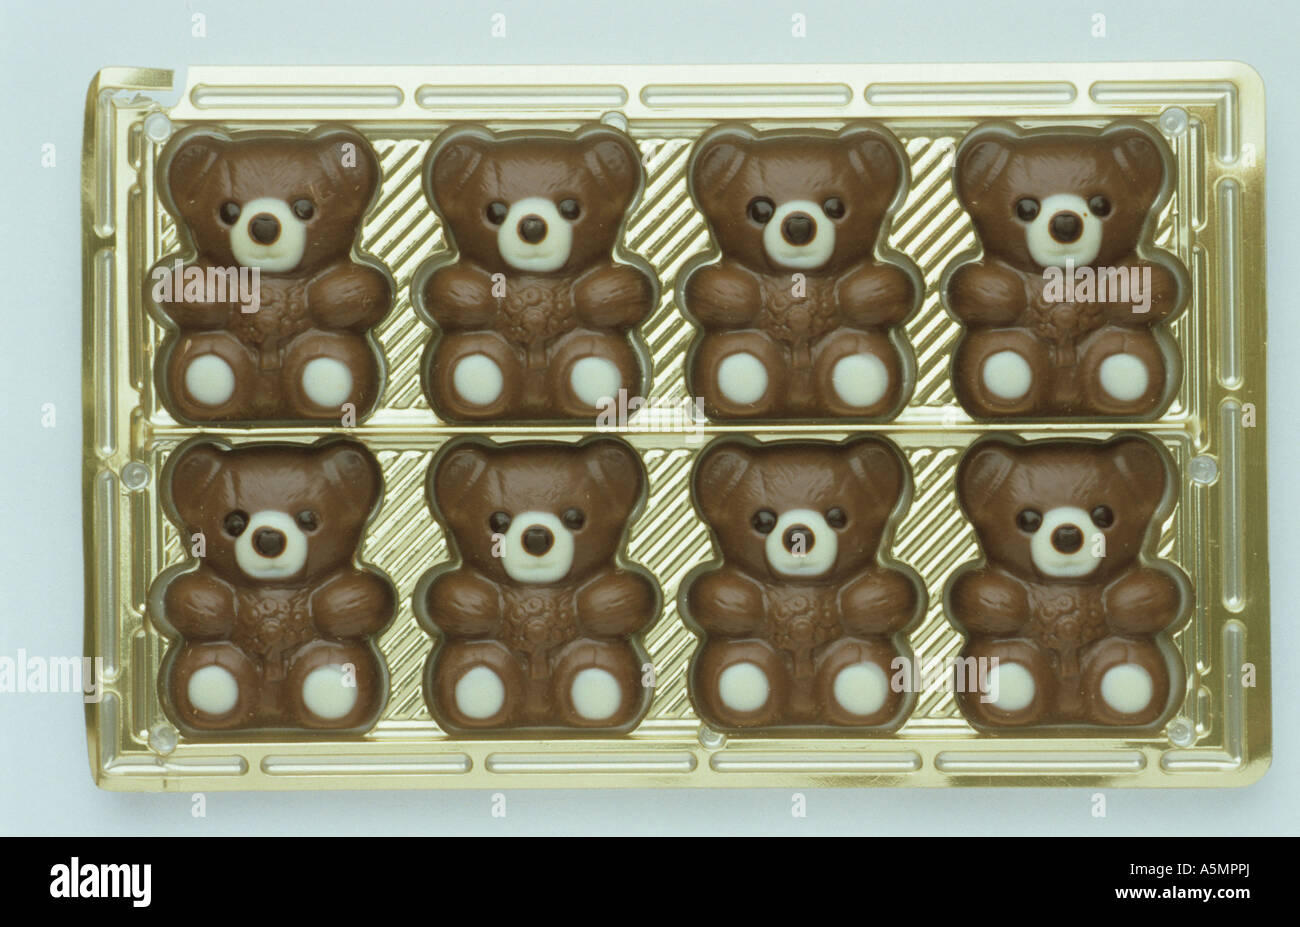 Schokolade chocolate Lebensmittel Nahrungsmittel Nahrung food generi alimentari alimentazione nutrizione Süßigkeiten - Stock Image